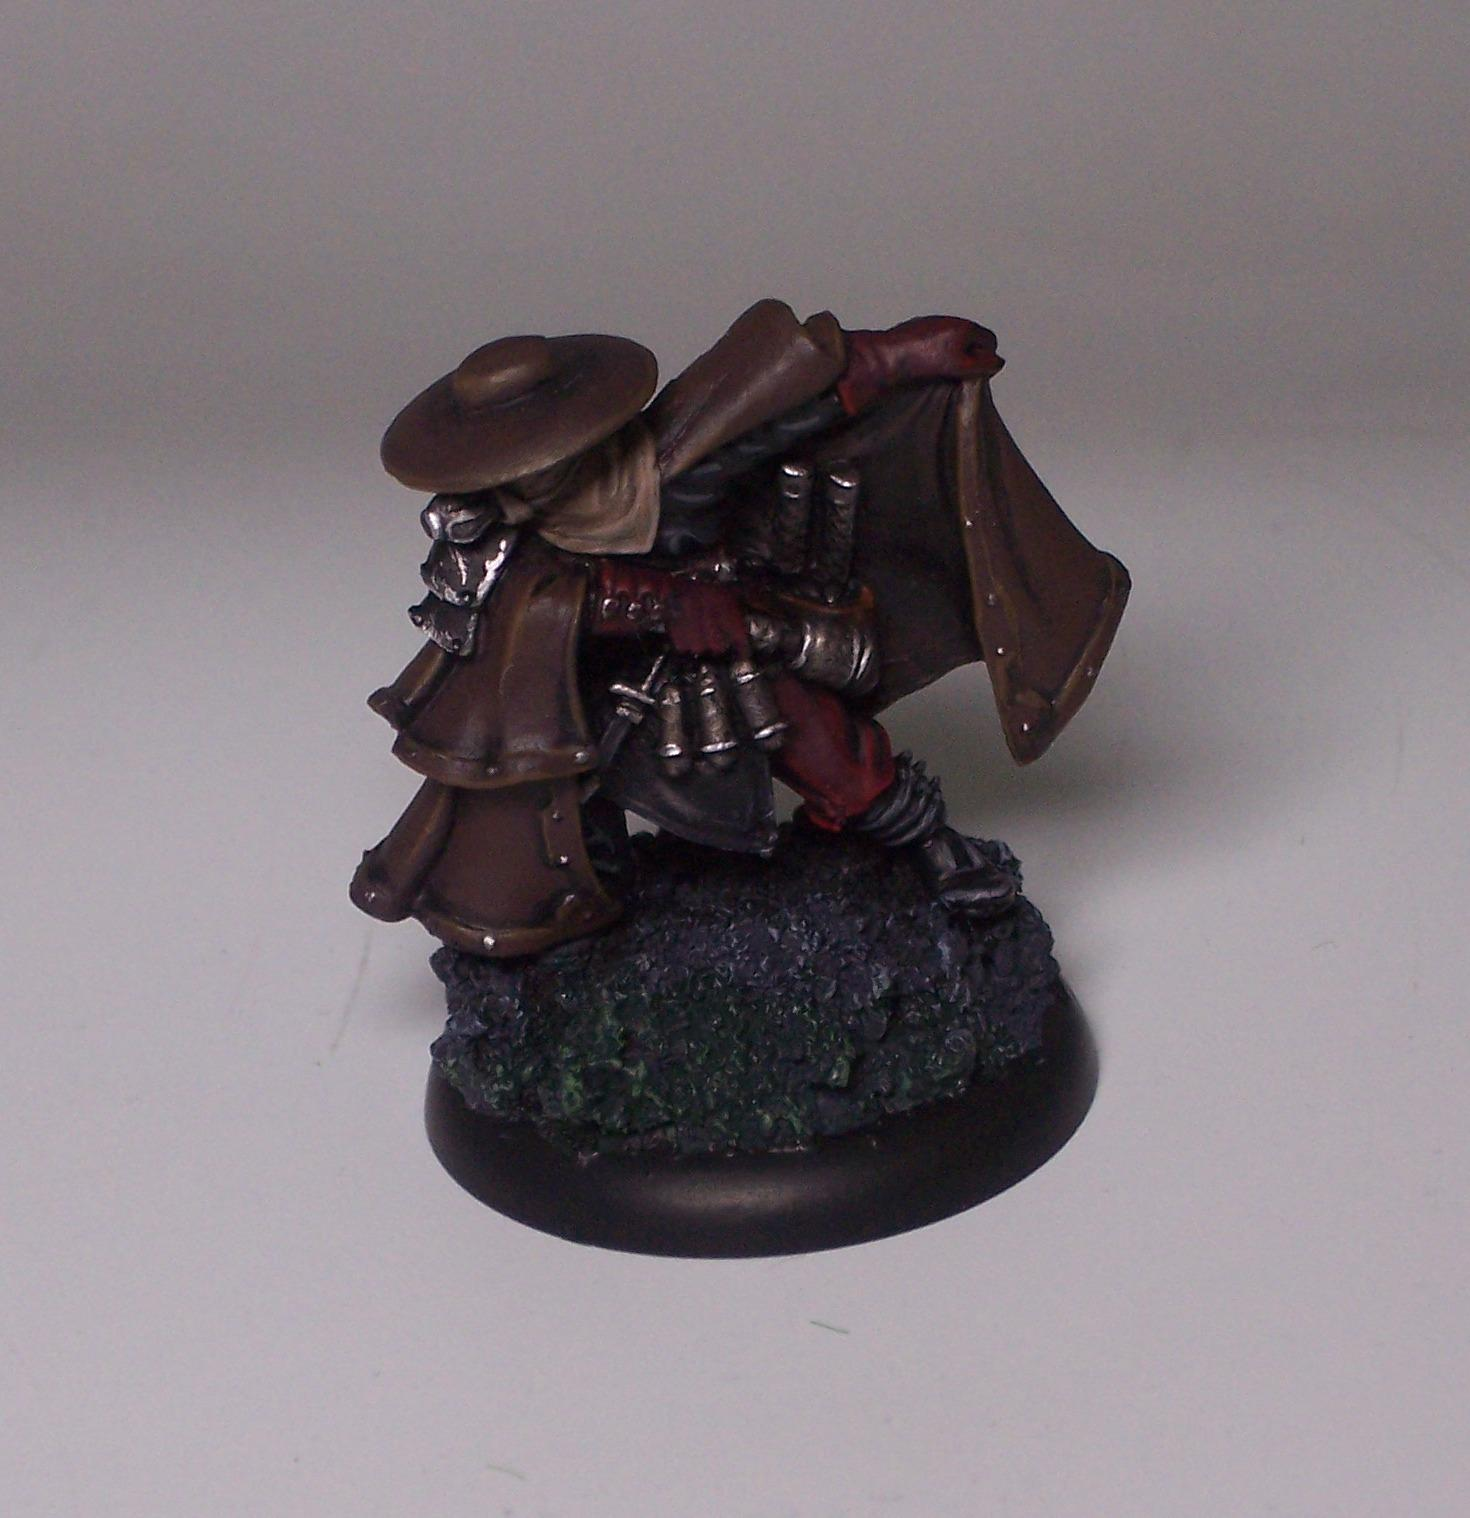 Gorman di Wulfe, Rogue Alchemist 1